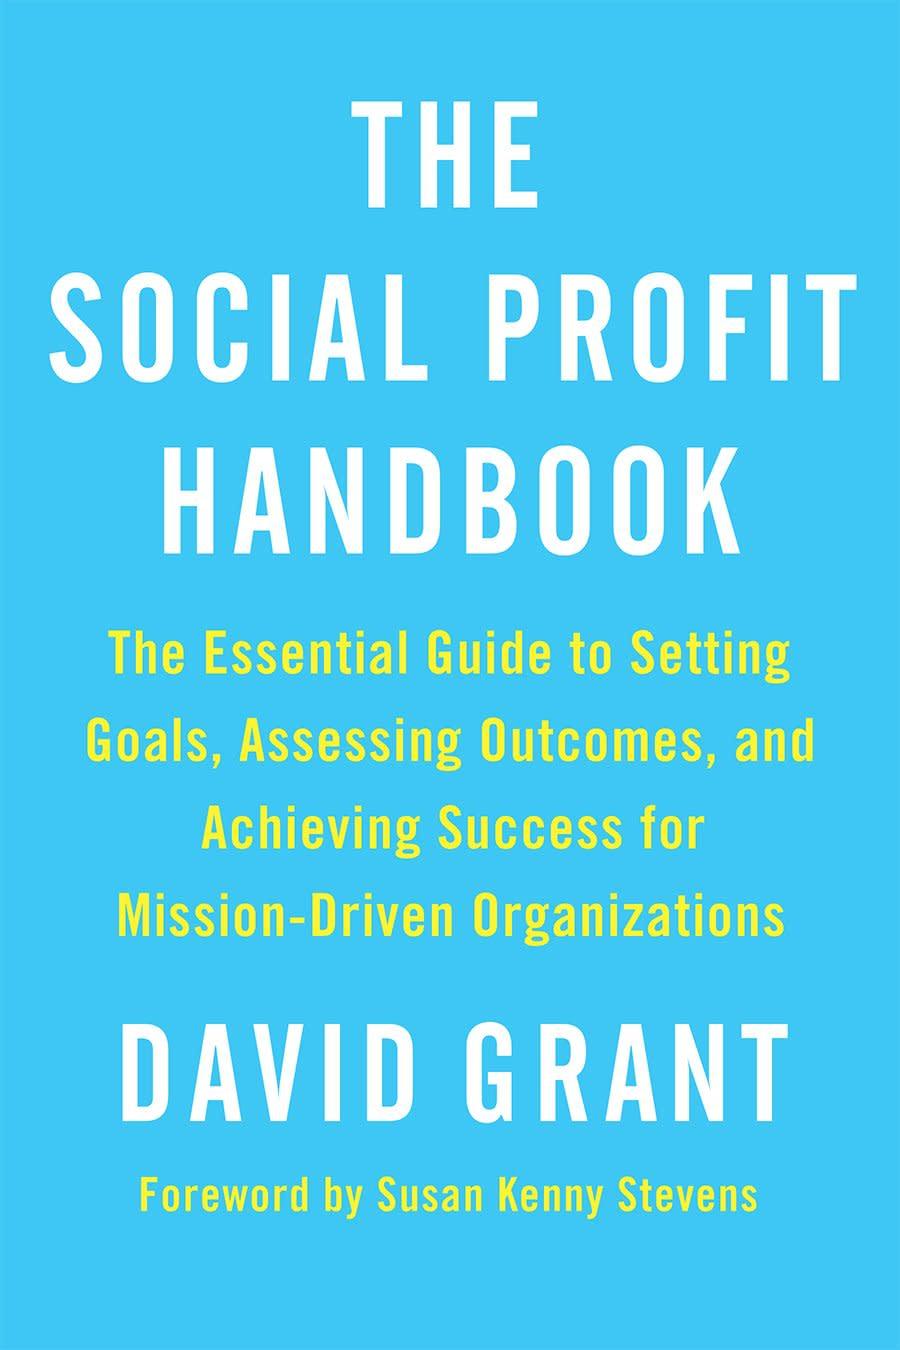 The Social Profit Handbook by David Grant